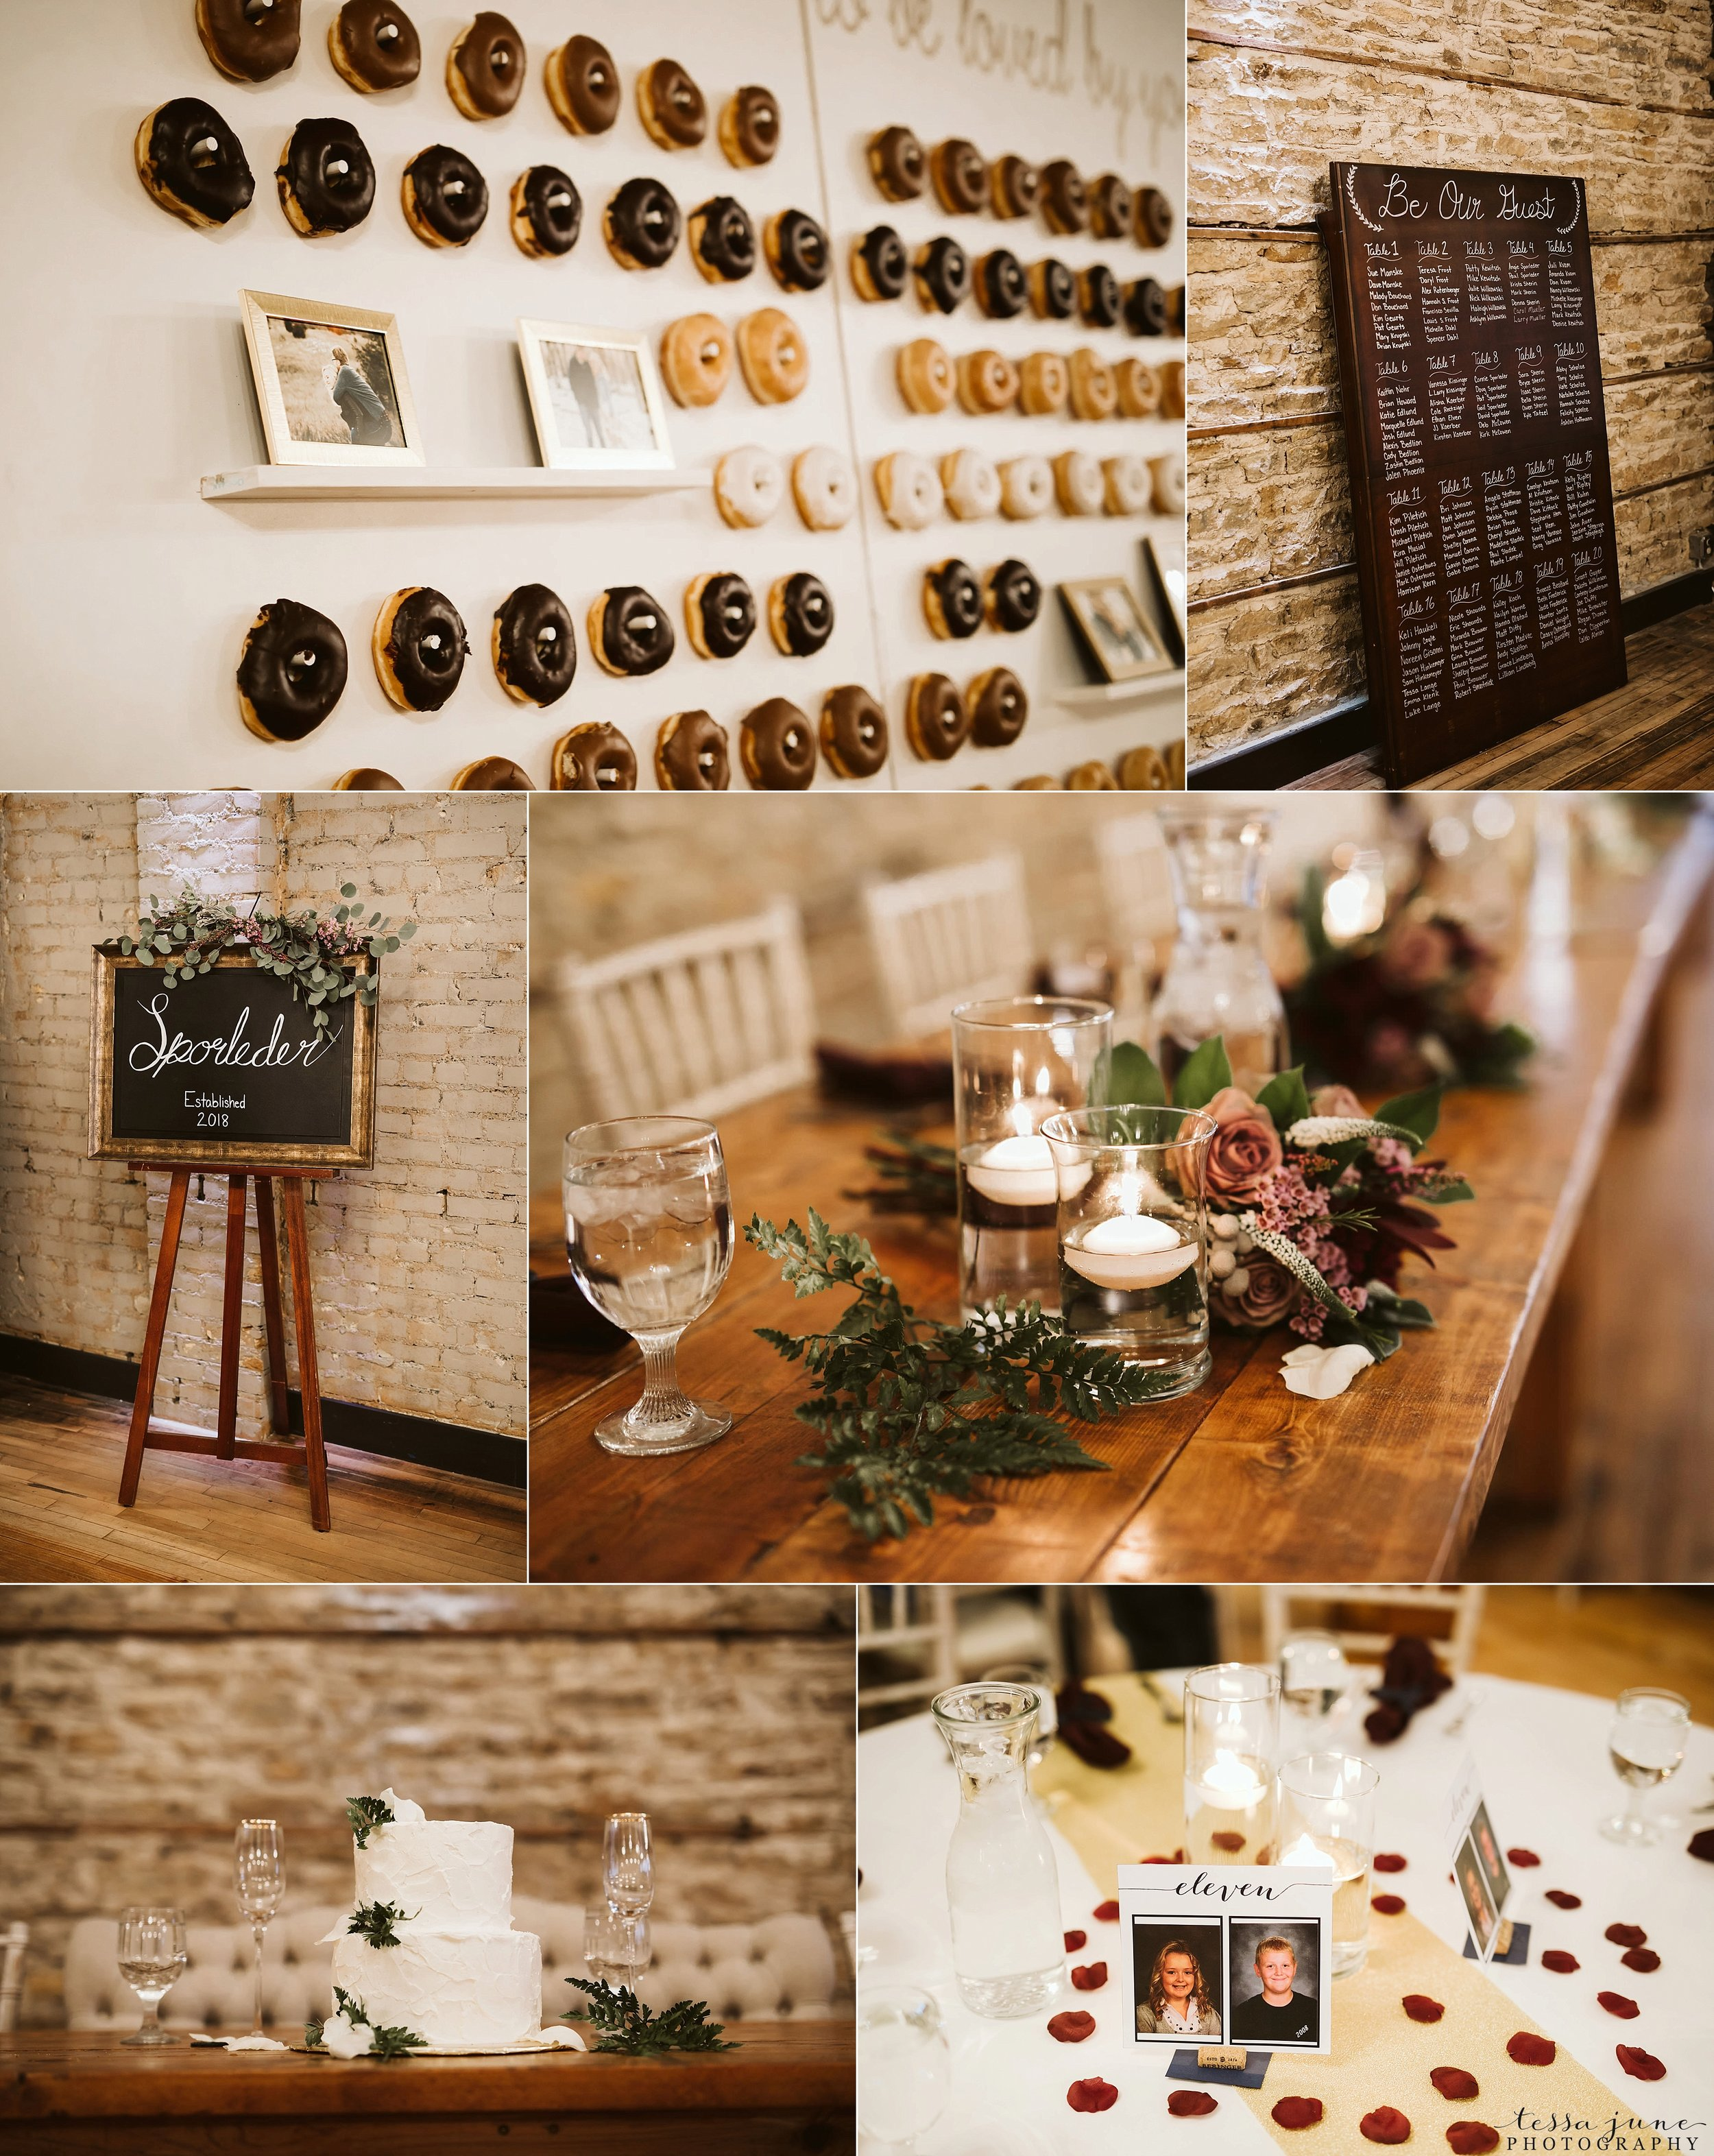 the-3-ten-event-venue-november-elegant-cozy-wedding-faribault-minnesota-123.jpg